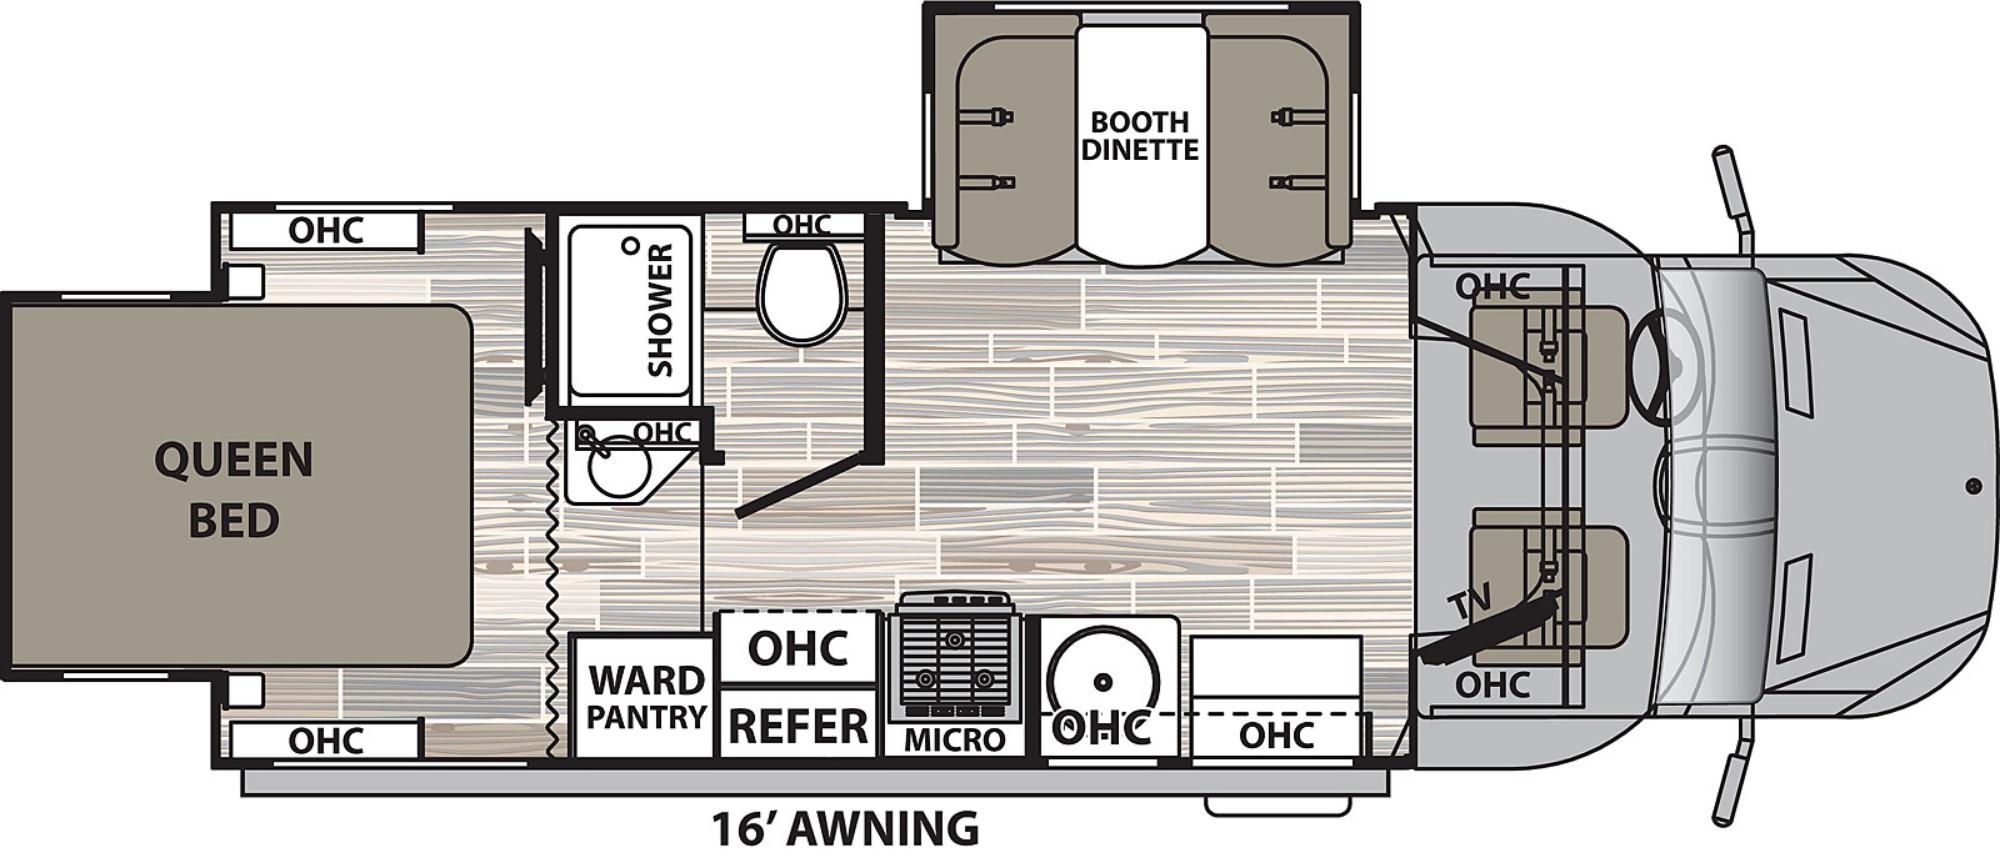 View Floor Plan for 2021 DYNAMAX ISATA 3 24RW